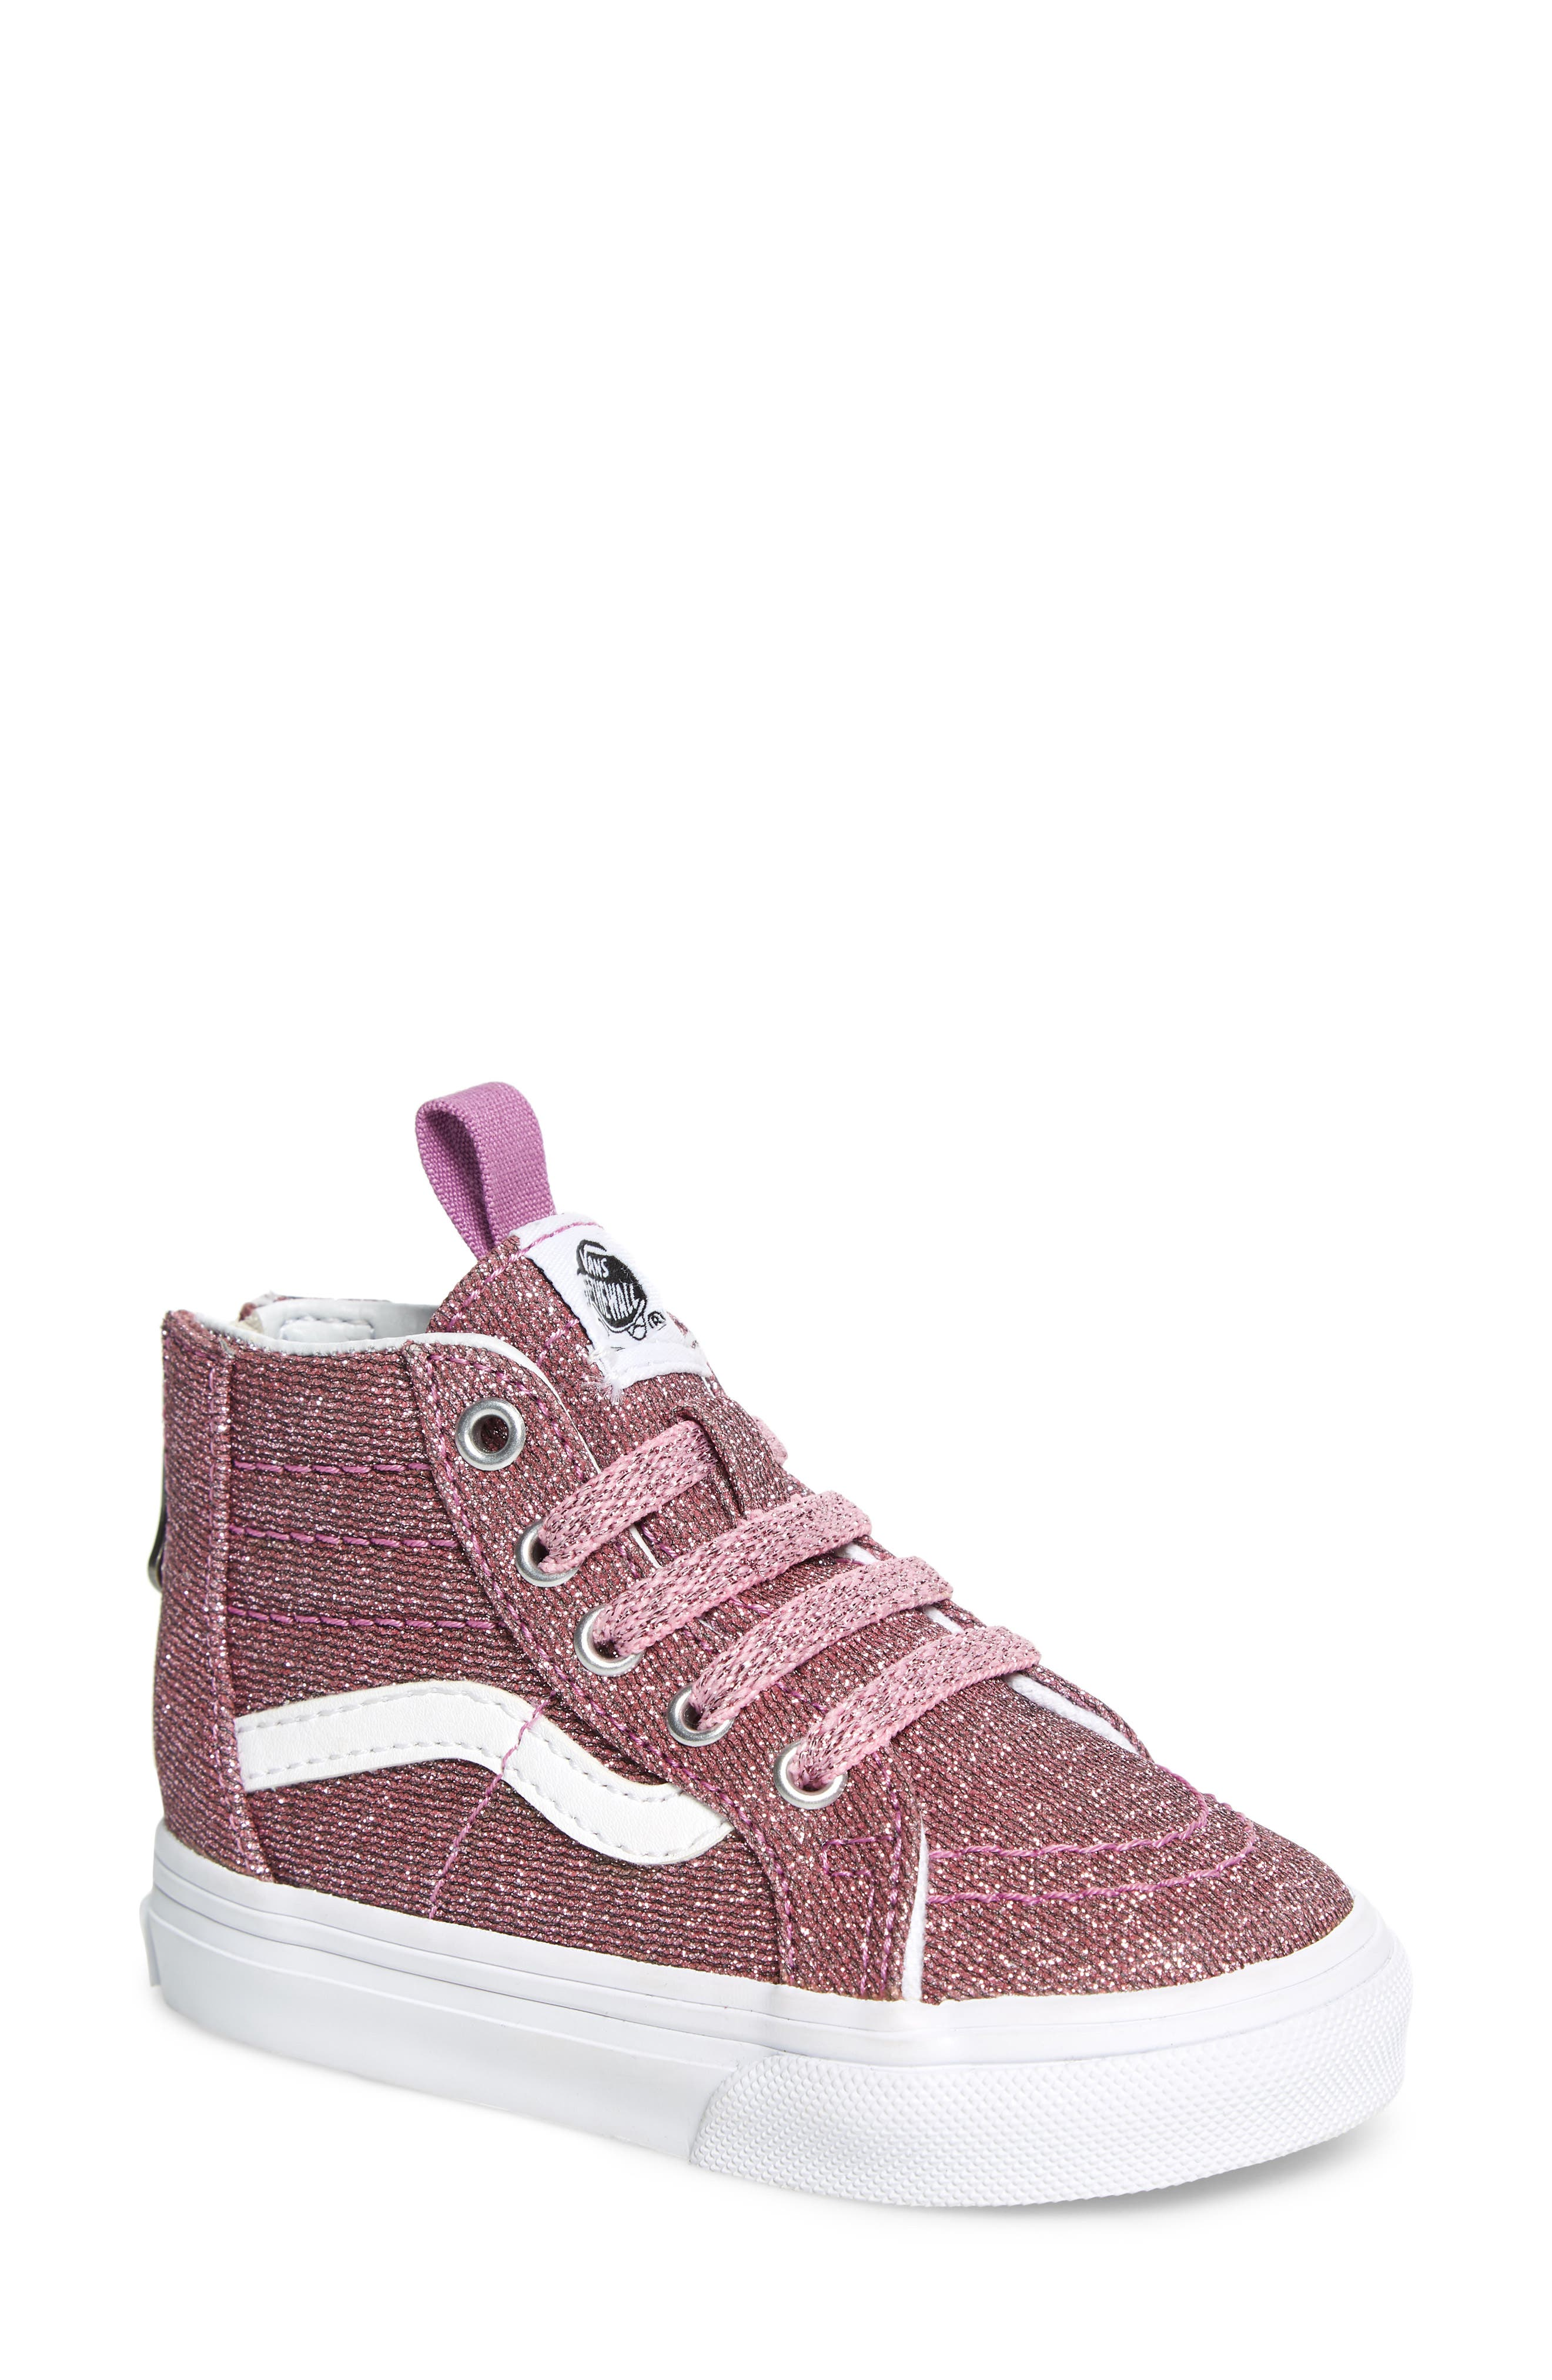 Sk8-Hi Zip Sneaker,                             Main thumbnail 1, color,                             Lurex Glitter Pink/ True White